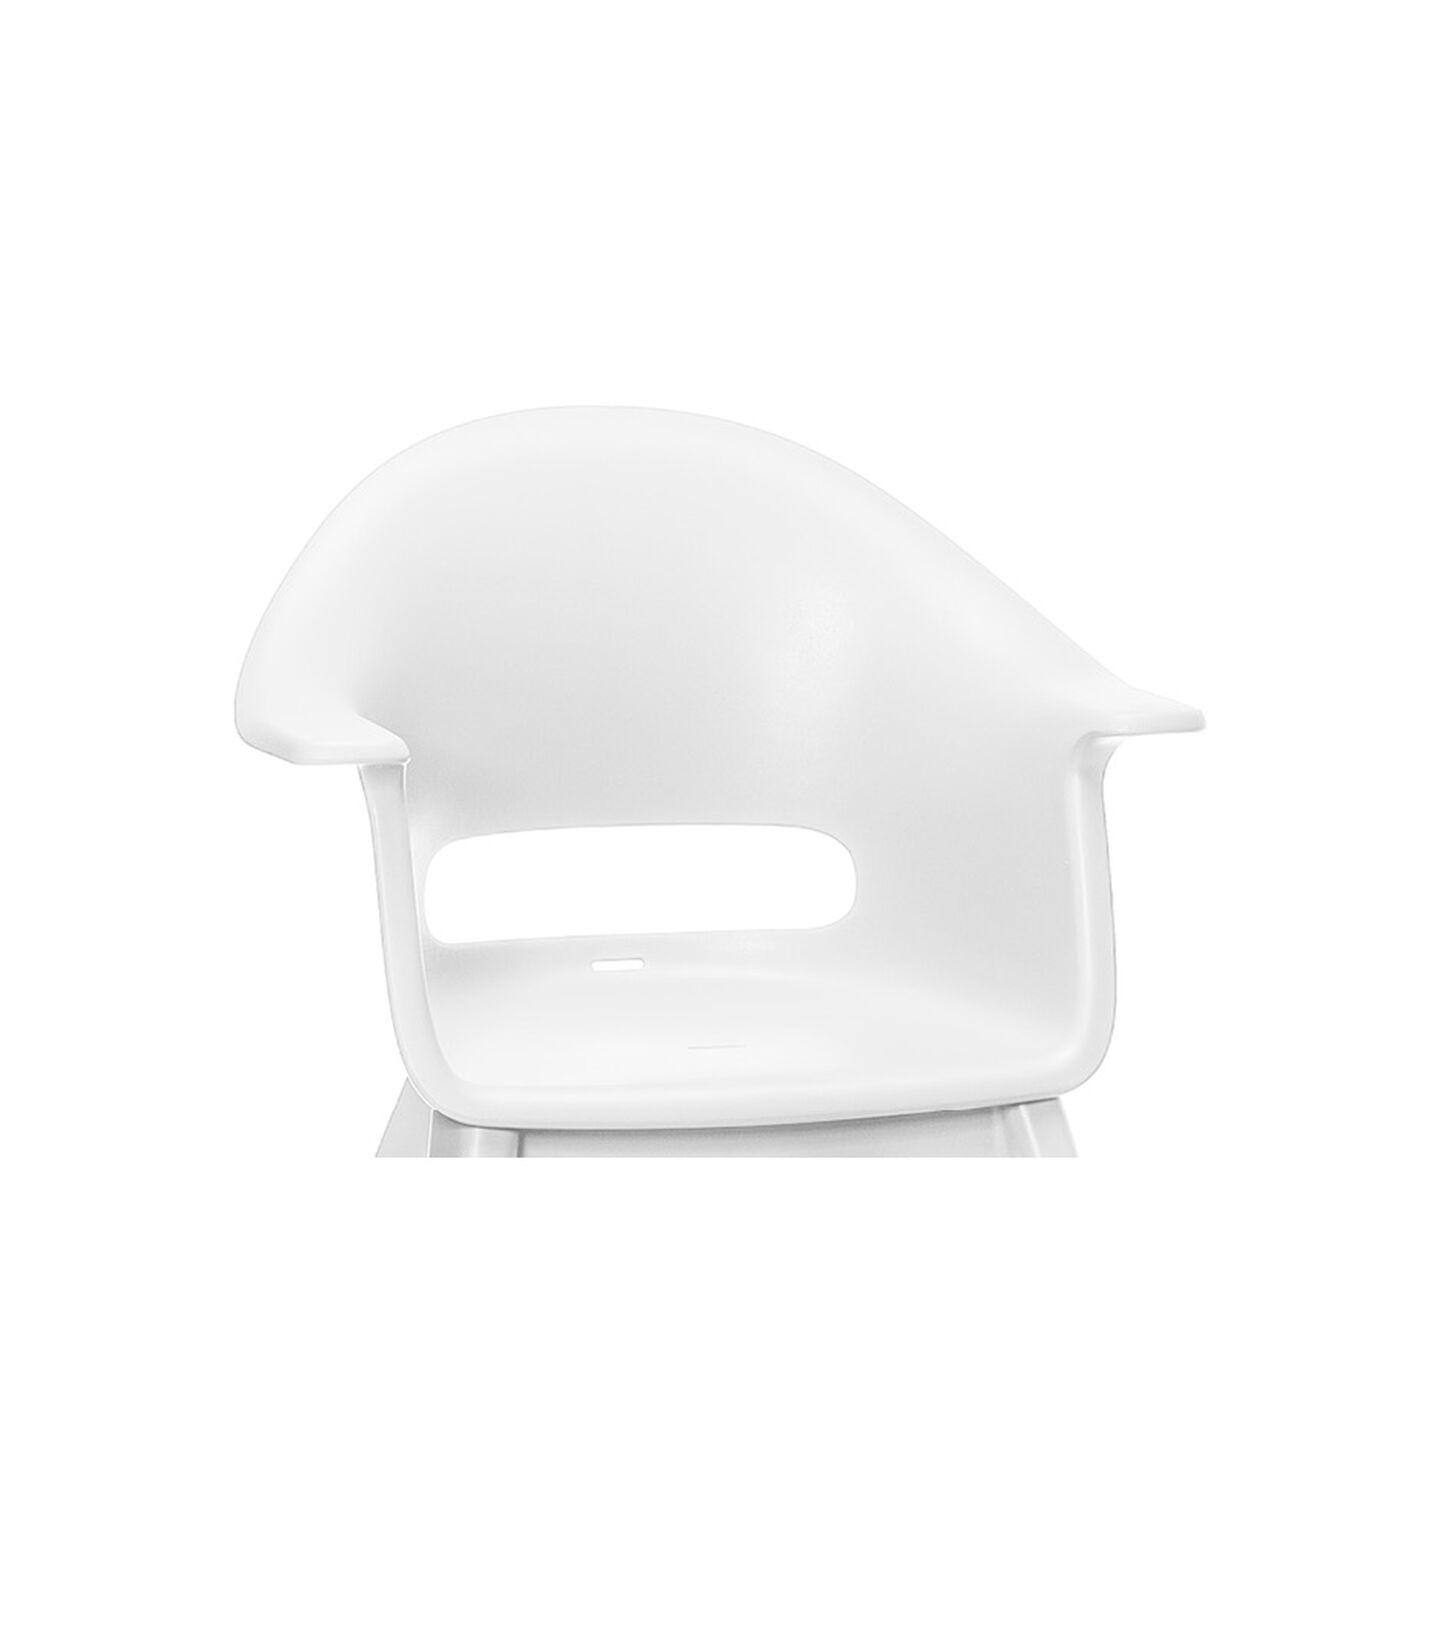 Siège Stokke® Clikk™ Blanc, Blanc, mainview view 2